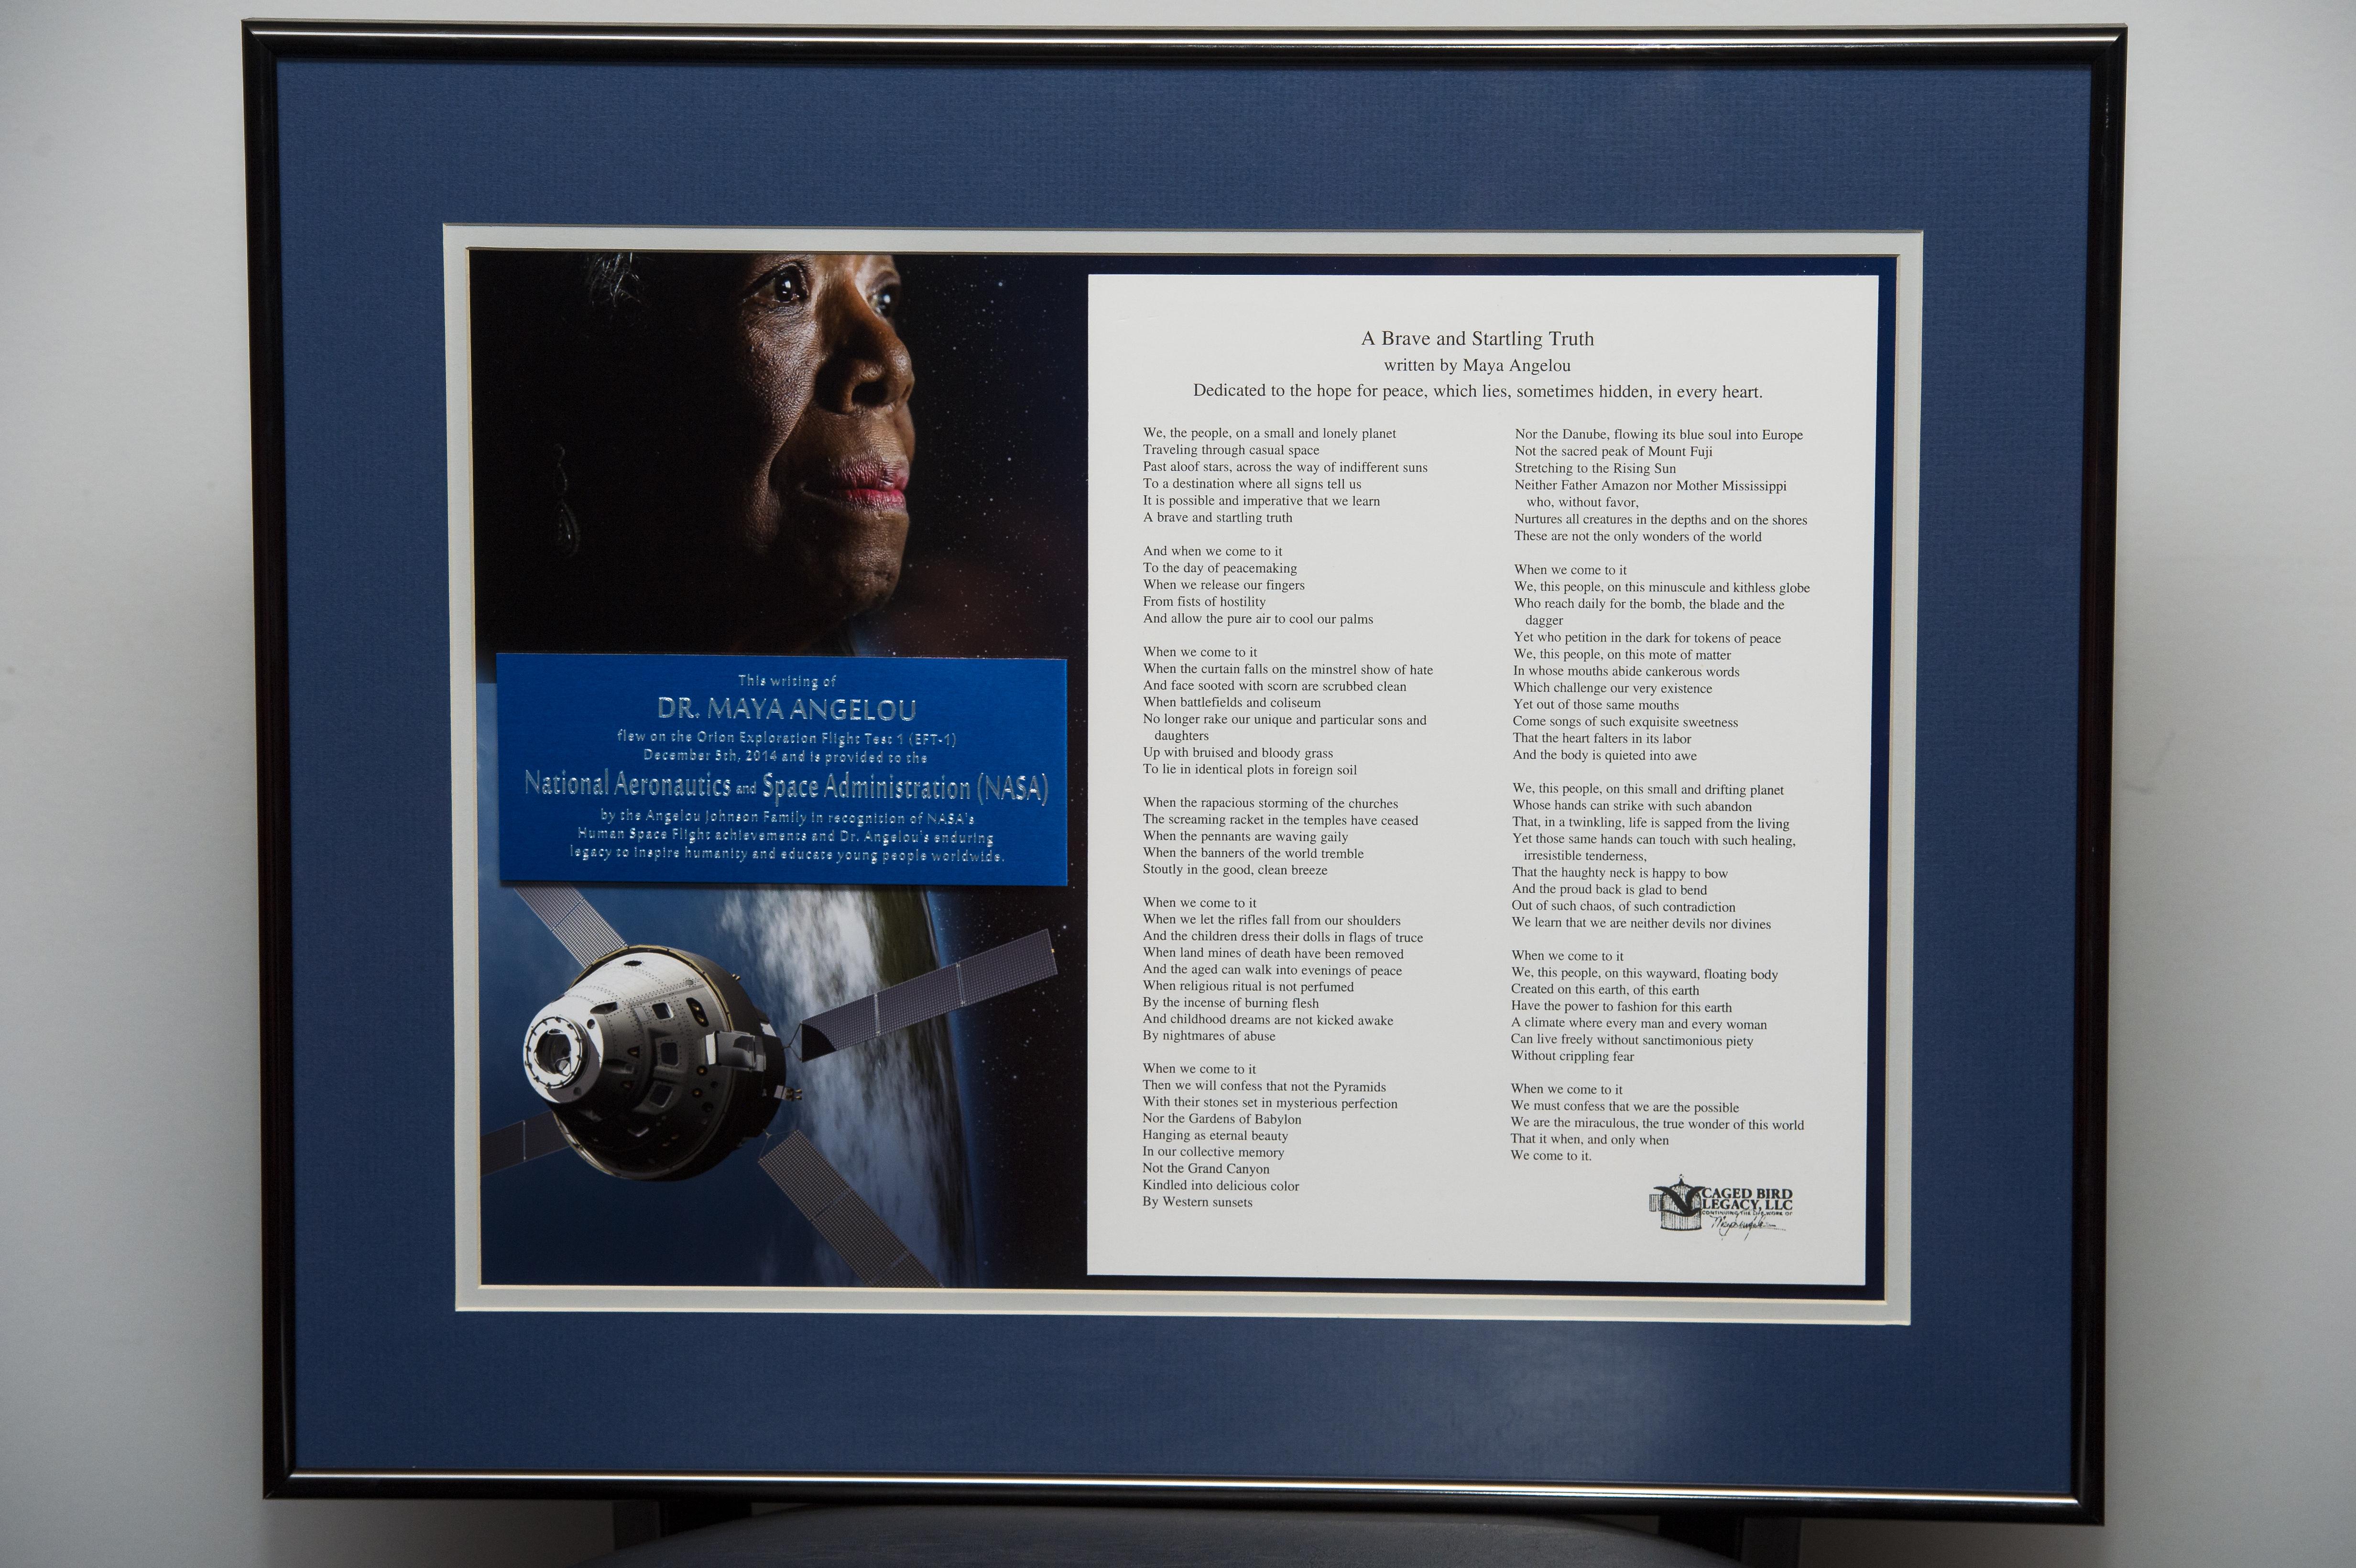 Maya Angelou Poem Flown on Orion Presented to NASA Administrator | NASA